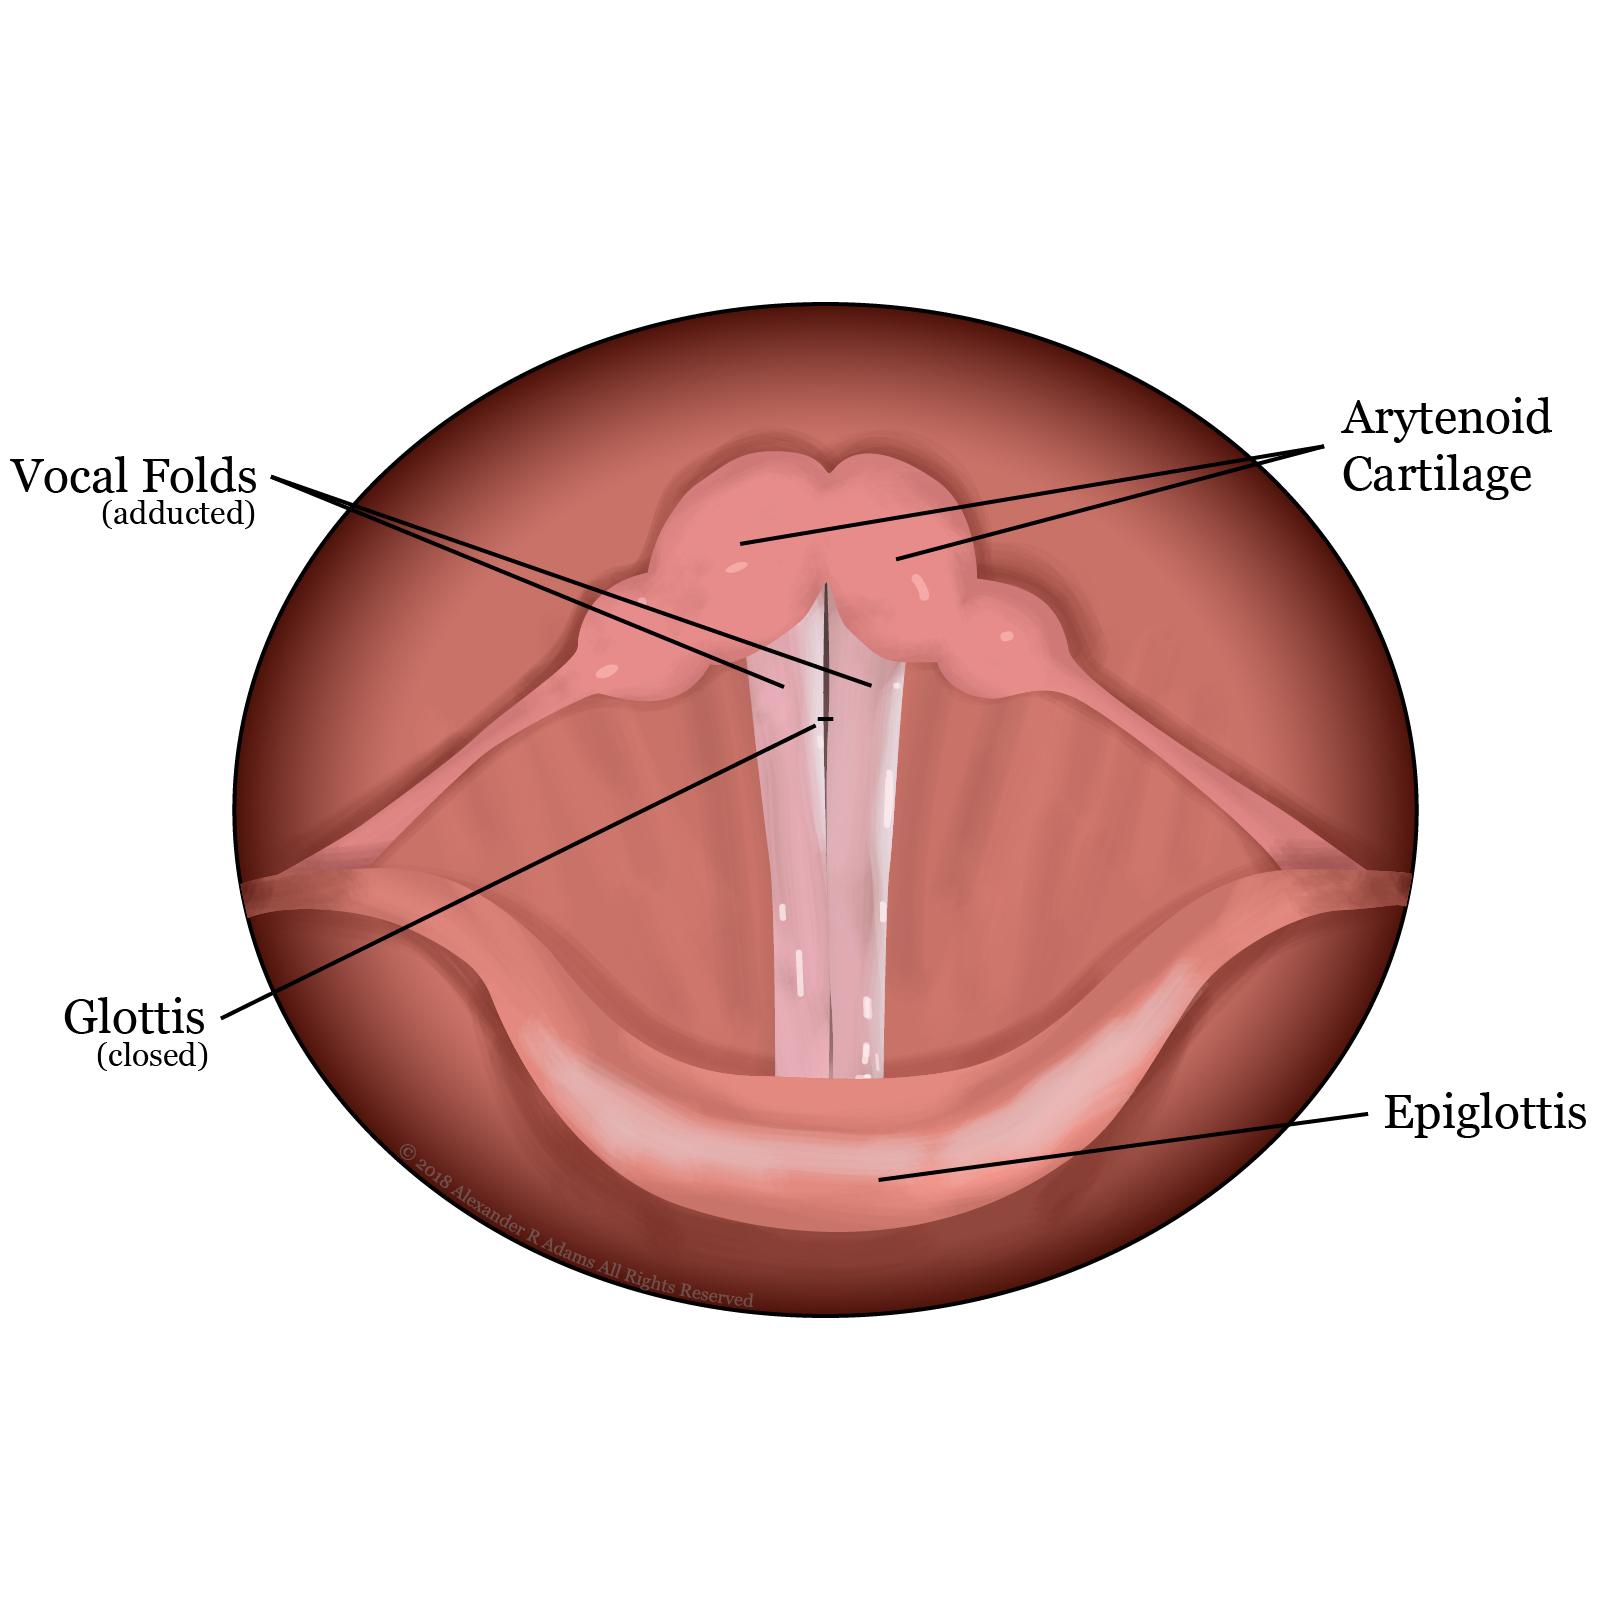 Vocal Folds Closed